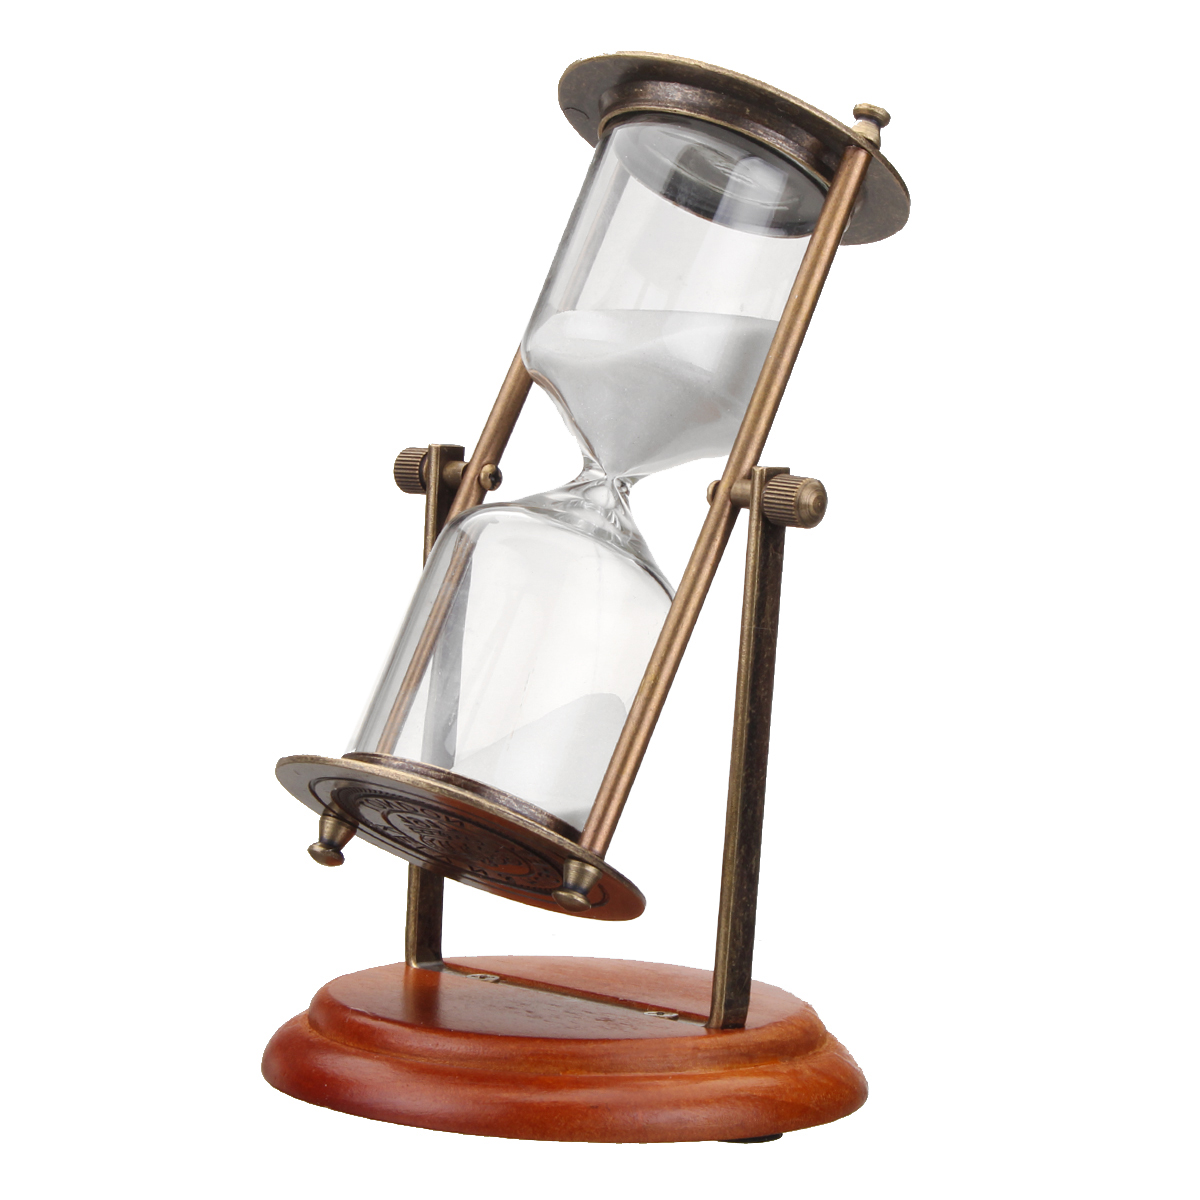 15minutes Rotating Sand Hourglass Sandglass Sand Timer Clock Gift Ornament